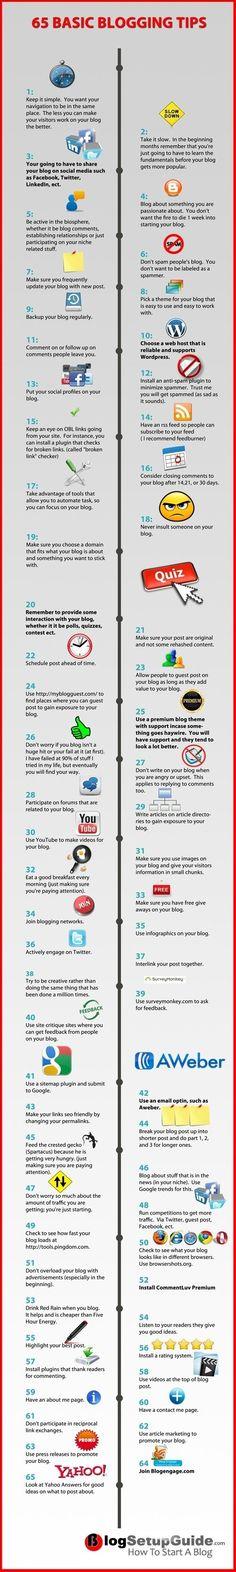 65 Basic Blogging Tips #Blog #Infographic (scheduled via http://www.tailwindapp.com?utm_source=pinterest&utm_medium=twpin&utm_content=post801973&utm_campaign=scheduler_attribution)